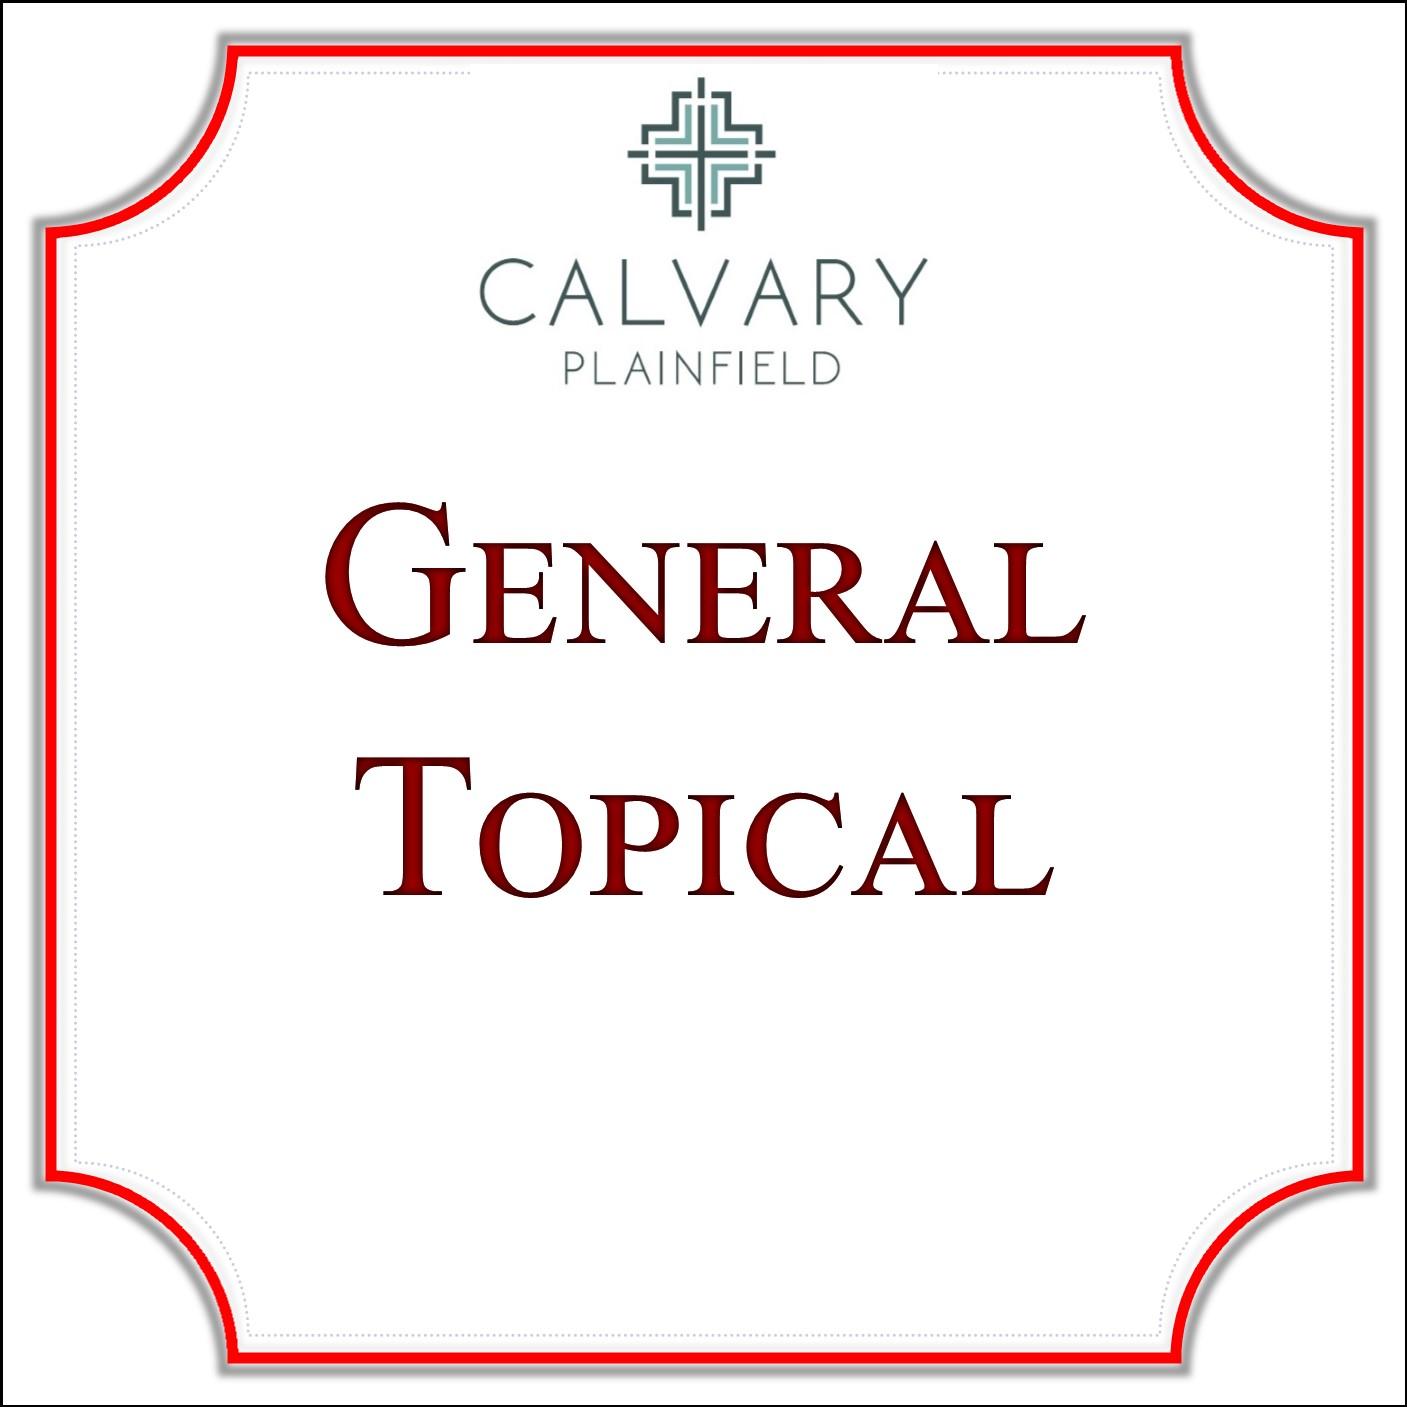 General Topical.jpg